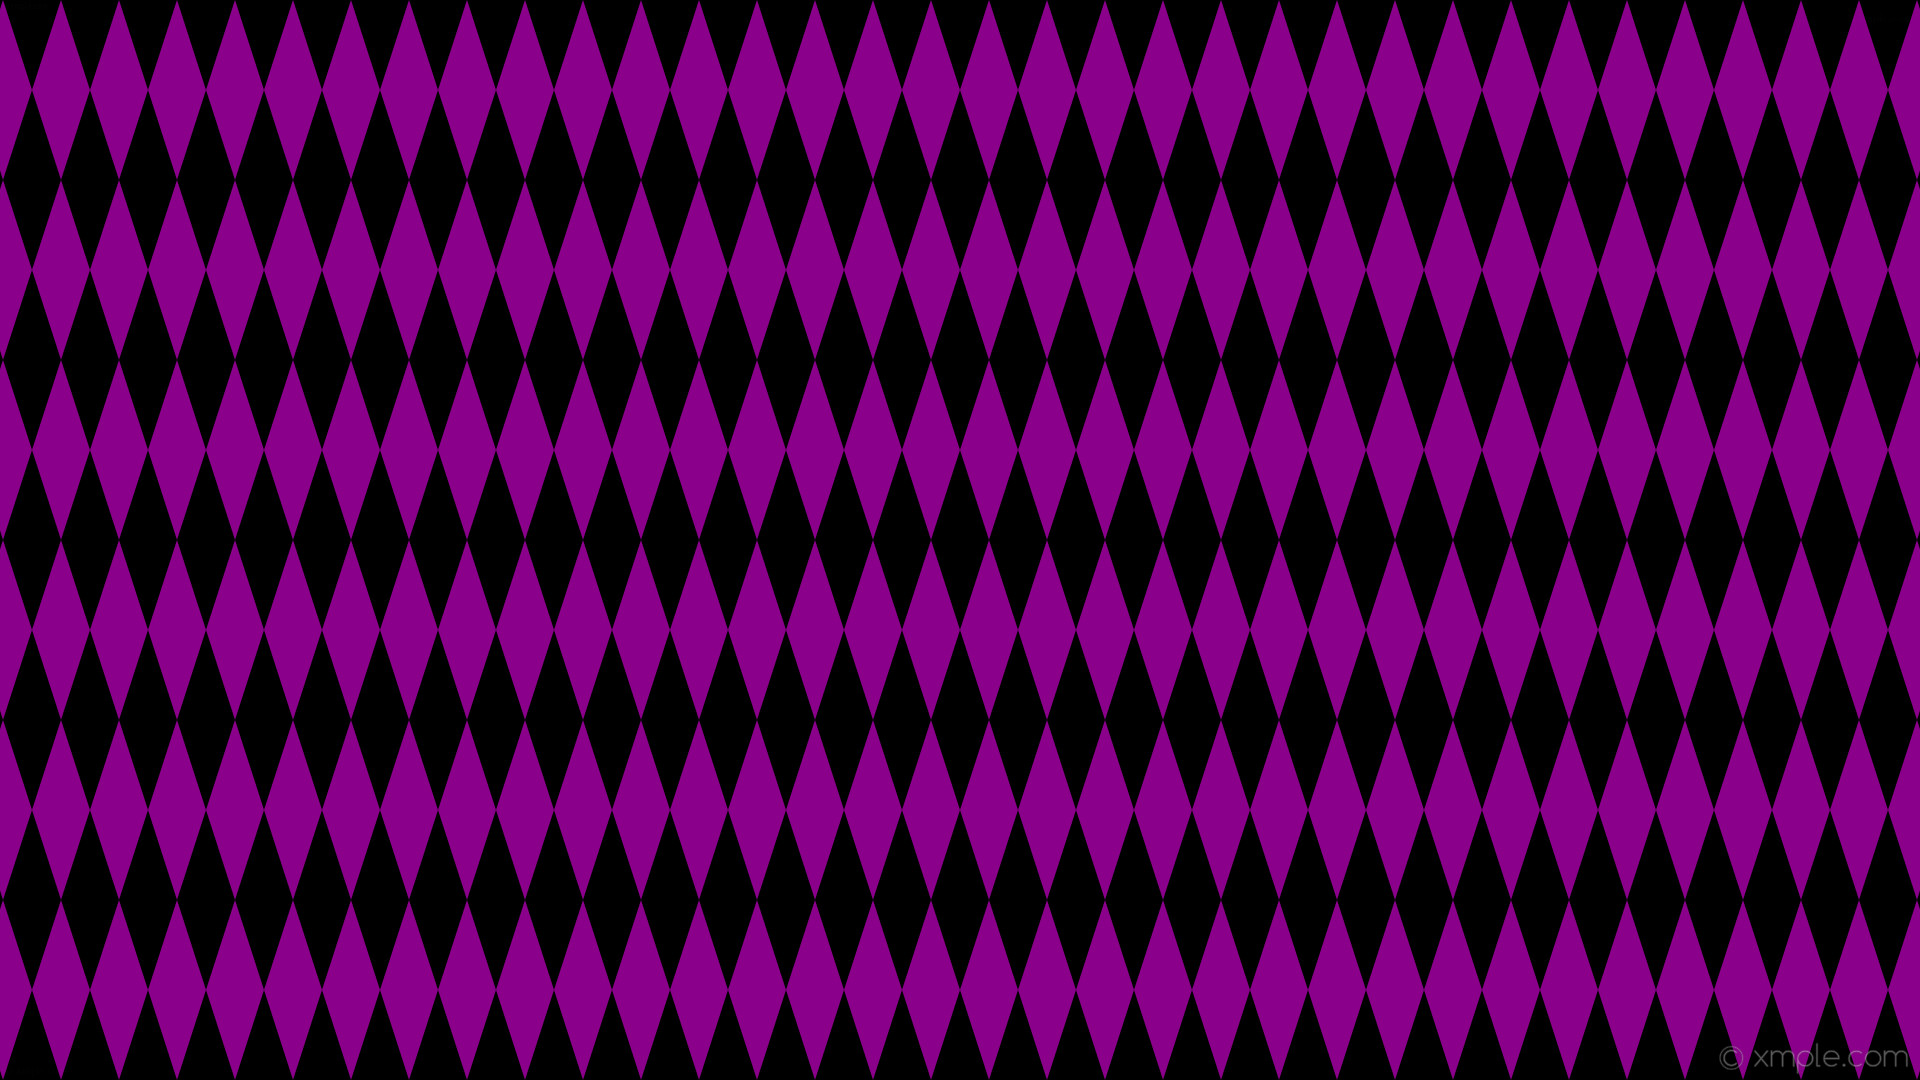 wallpaper rhombus lozenge purple diamond black dark magenta #000000 #8b008b  90° 180px 58px